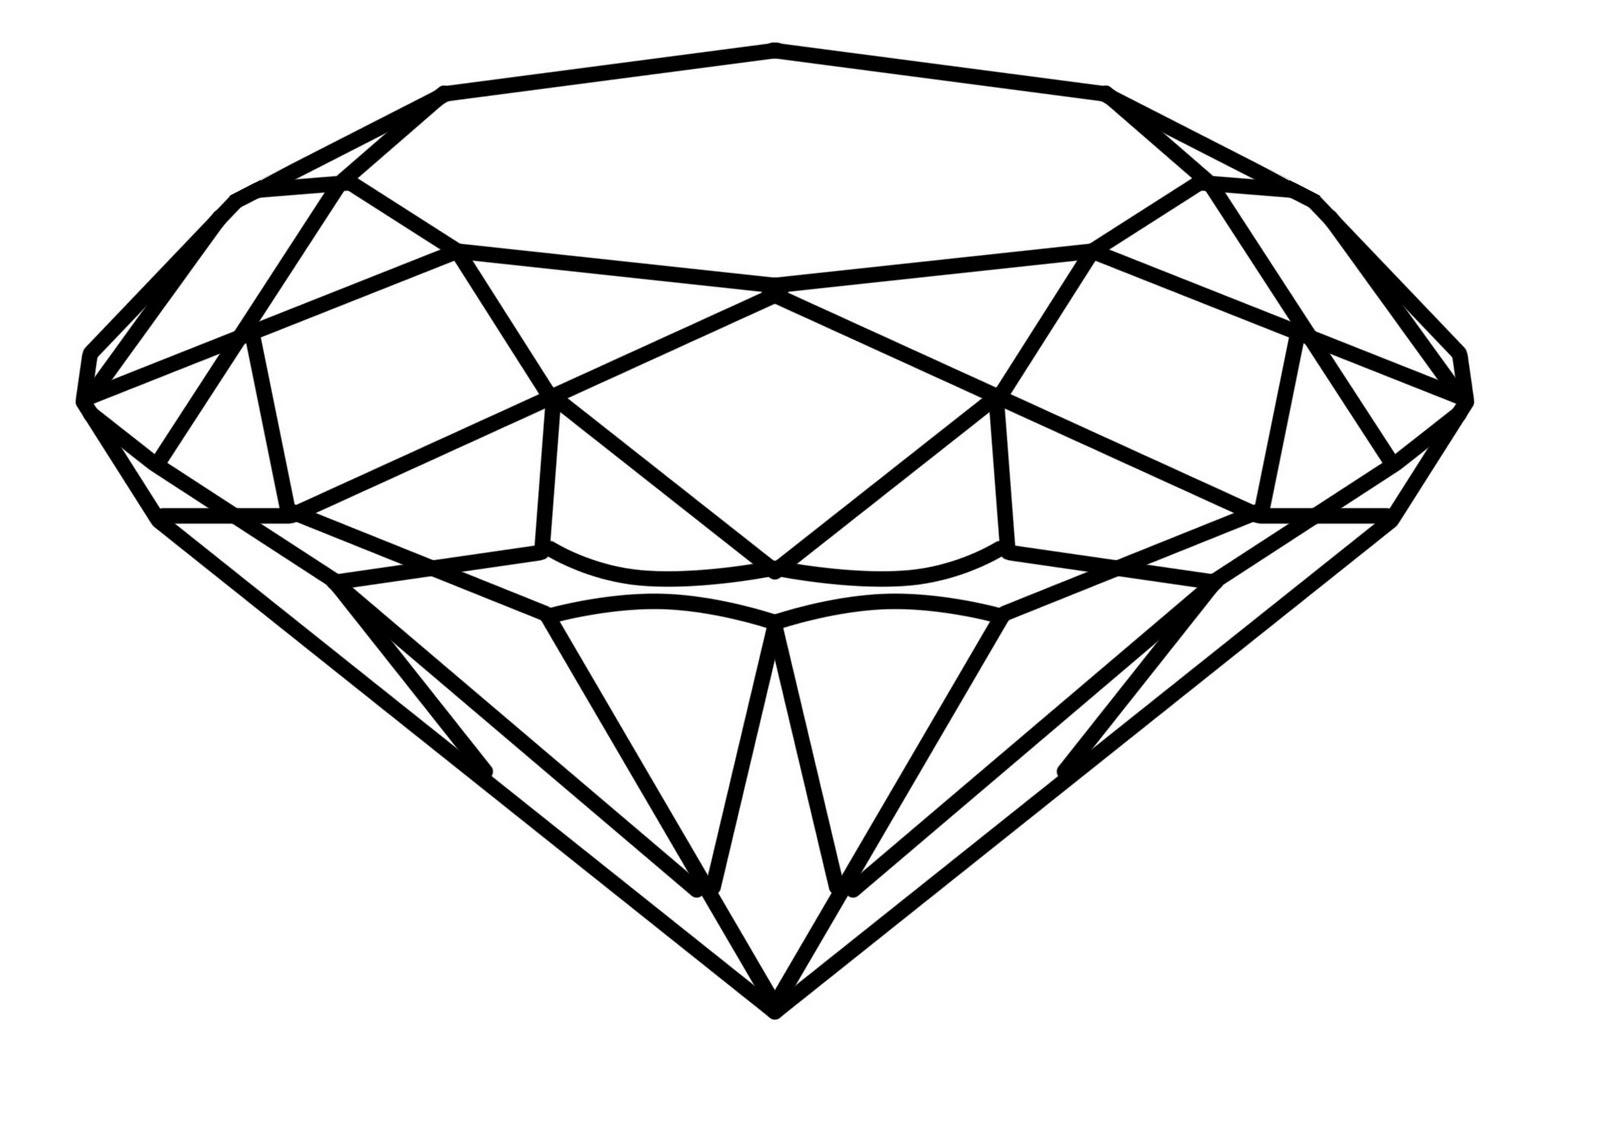 Sketch clipart diamond outline  Art Outline Download on